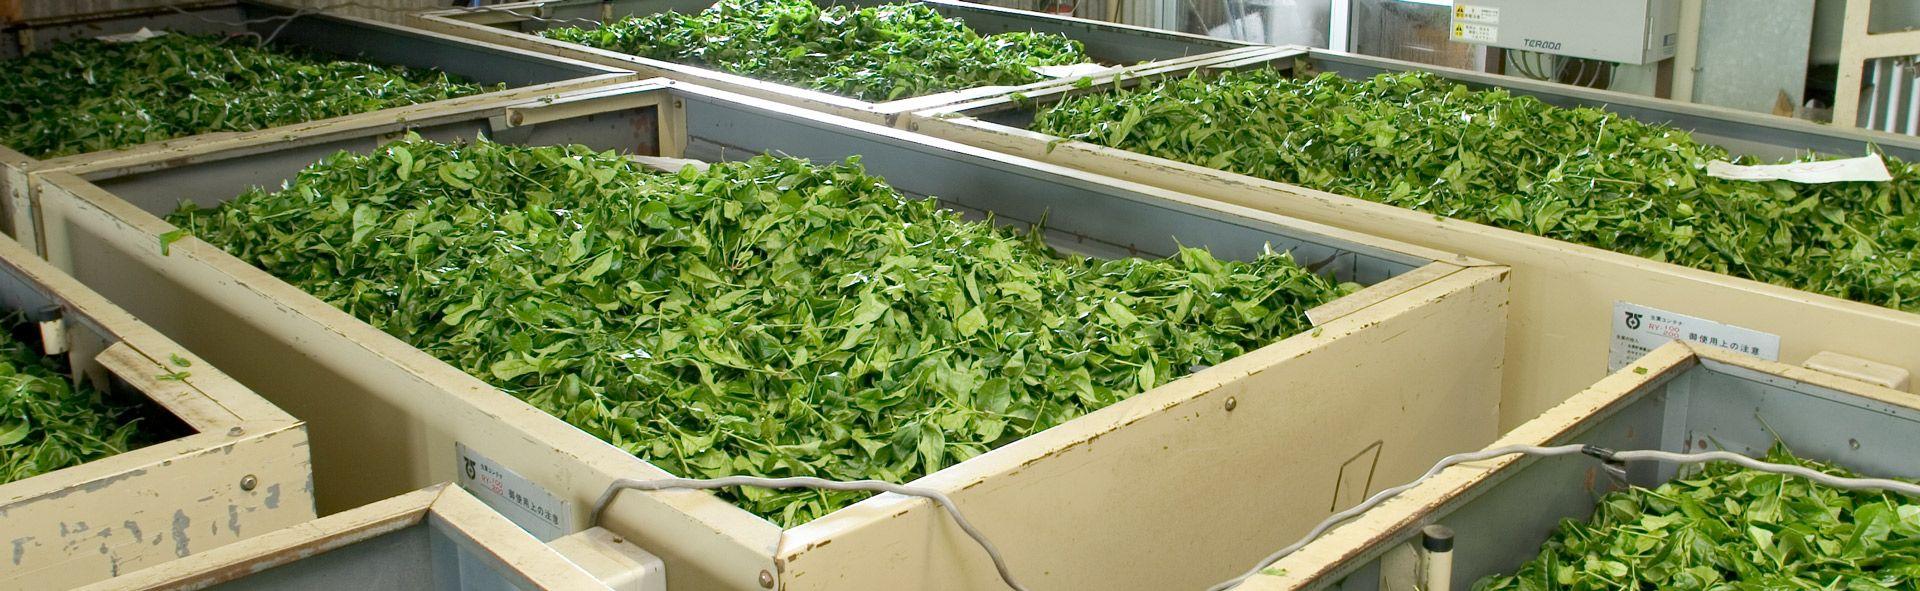 Header Image: Tea leaves in wooden bins after being harvested